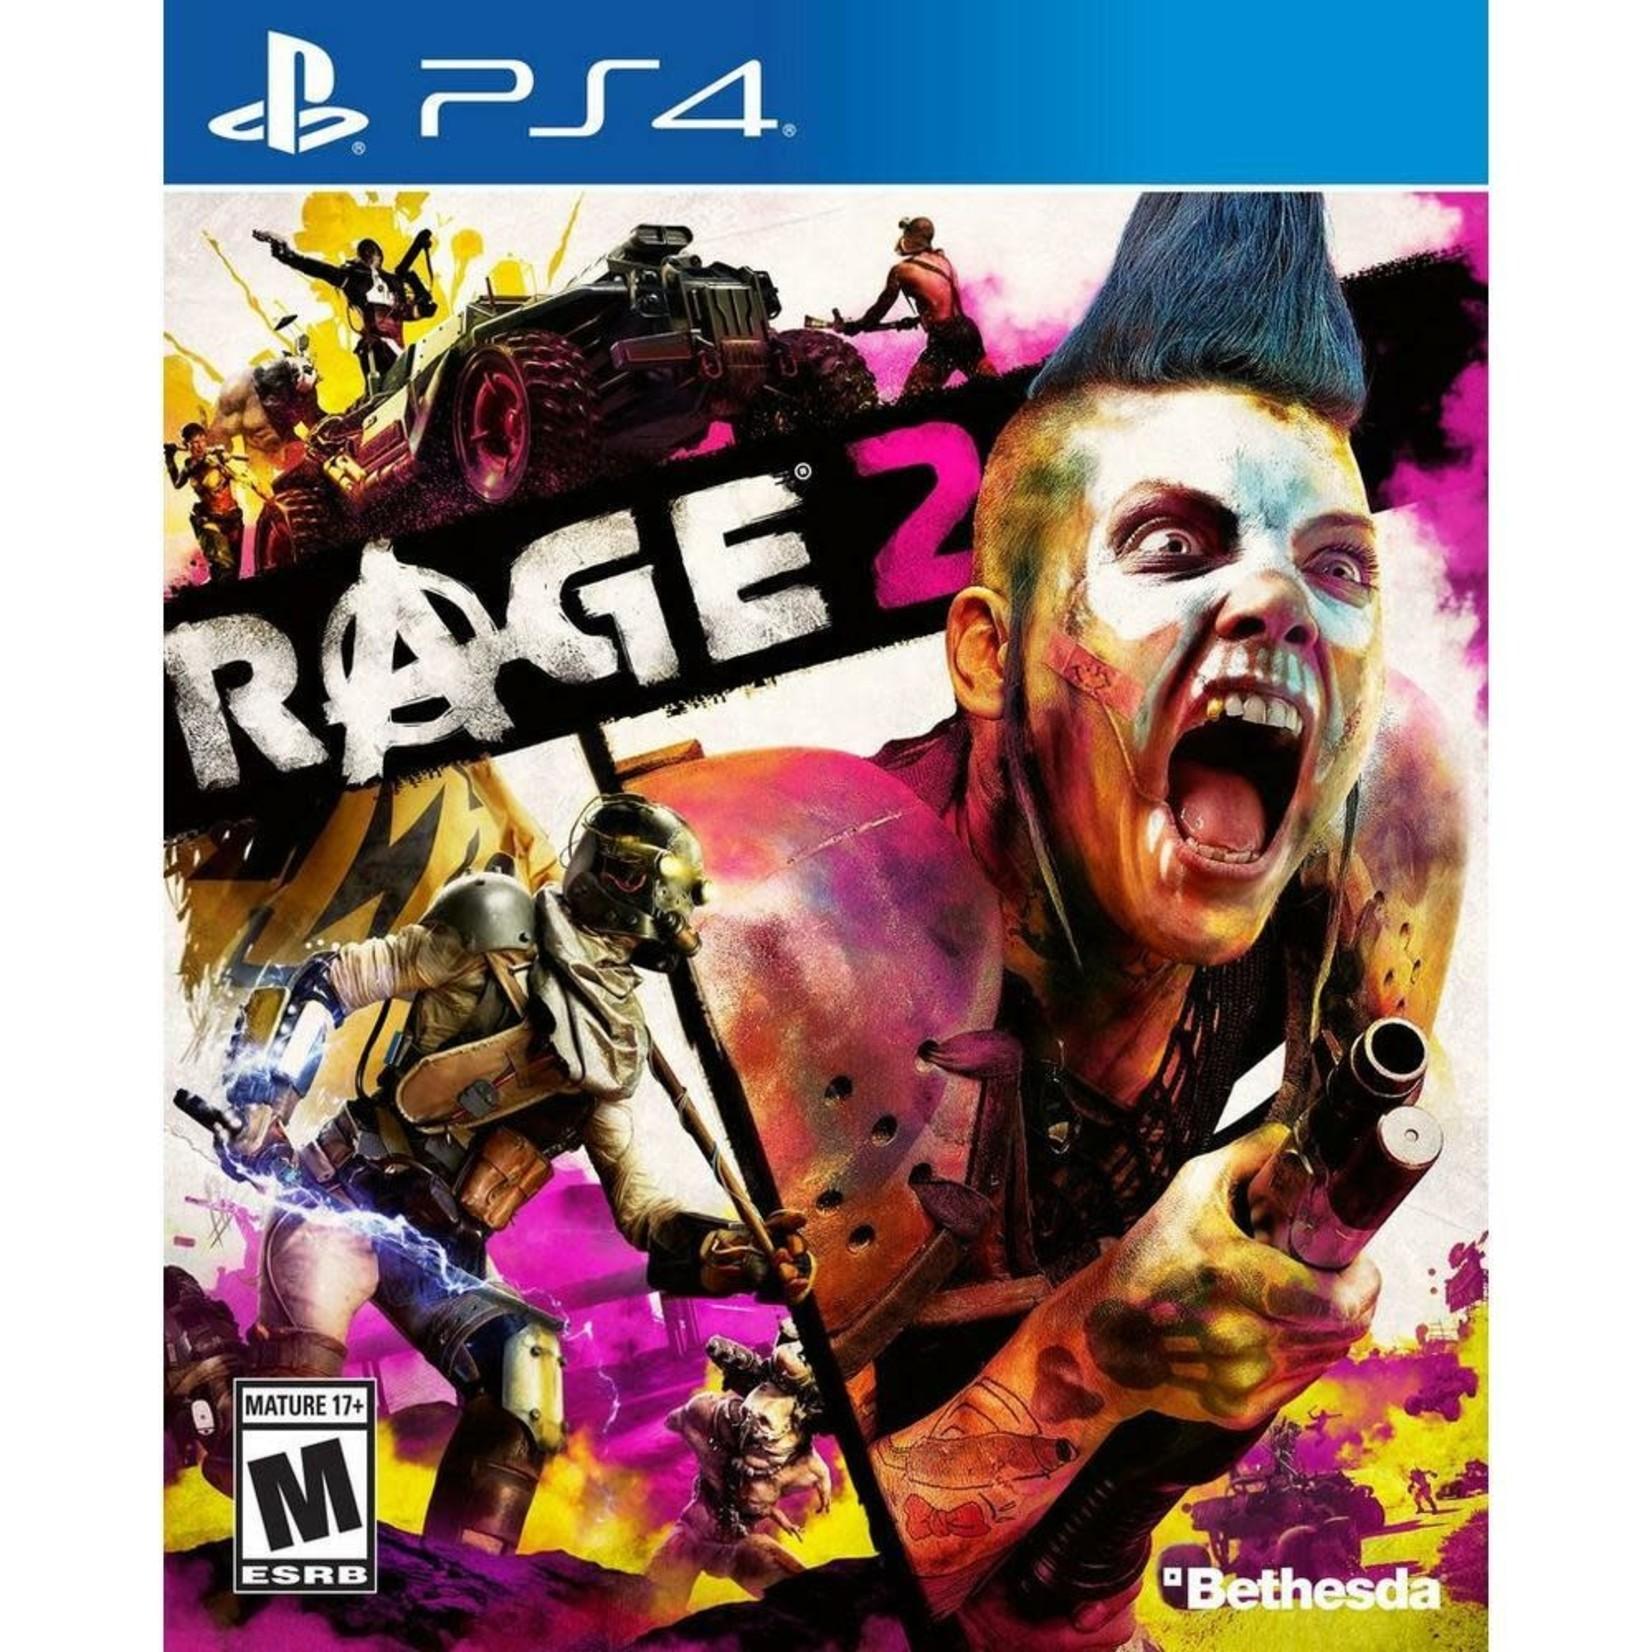 PS4U-Rage 2